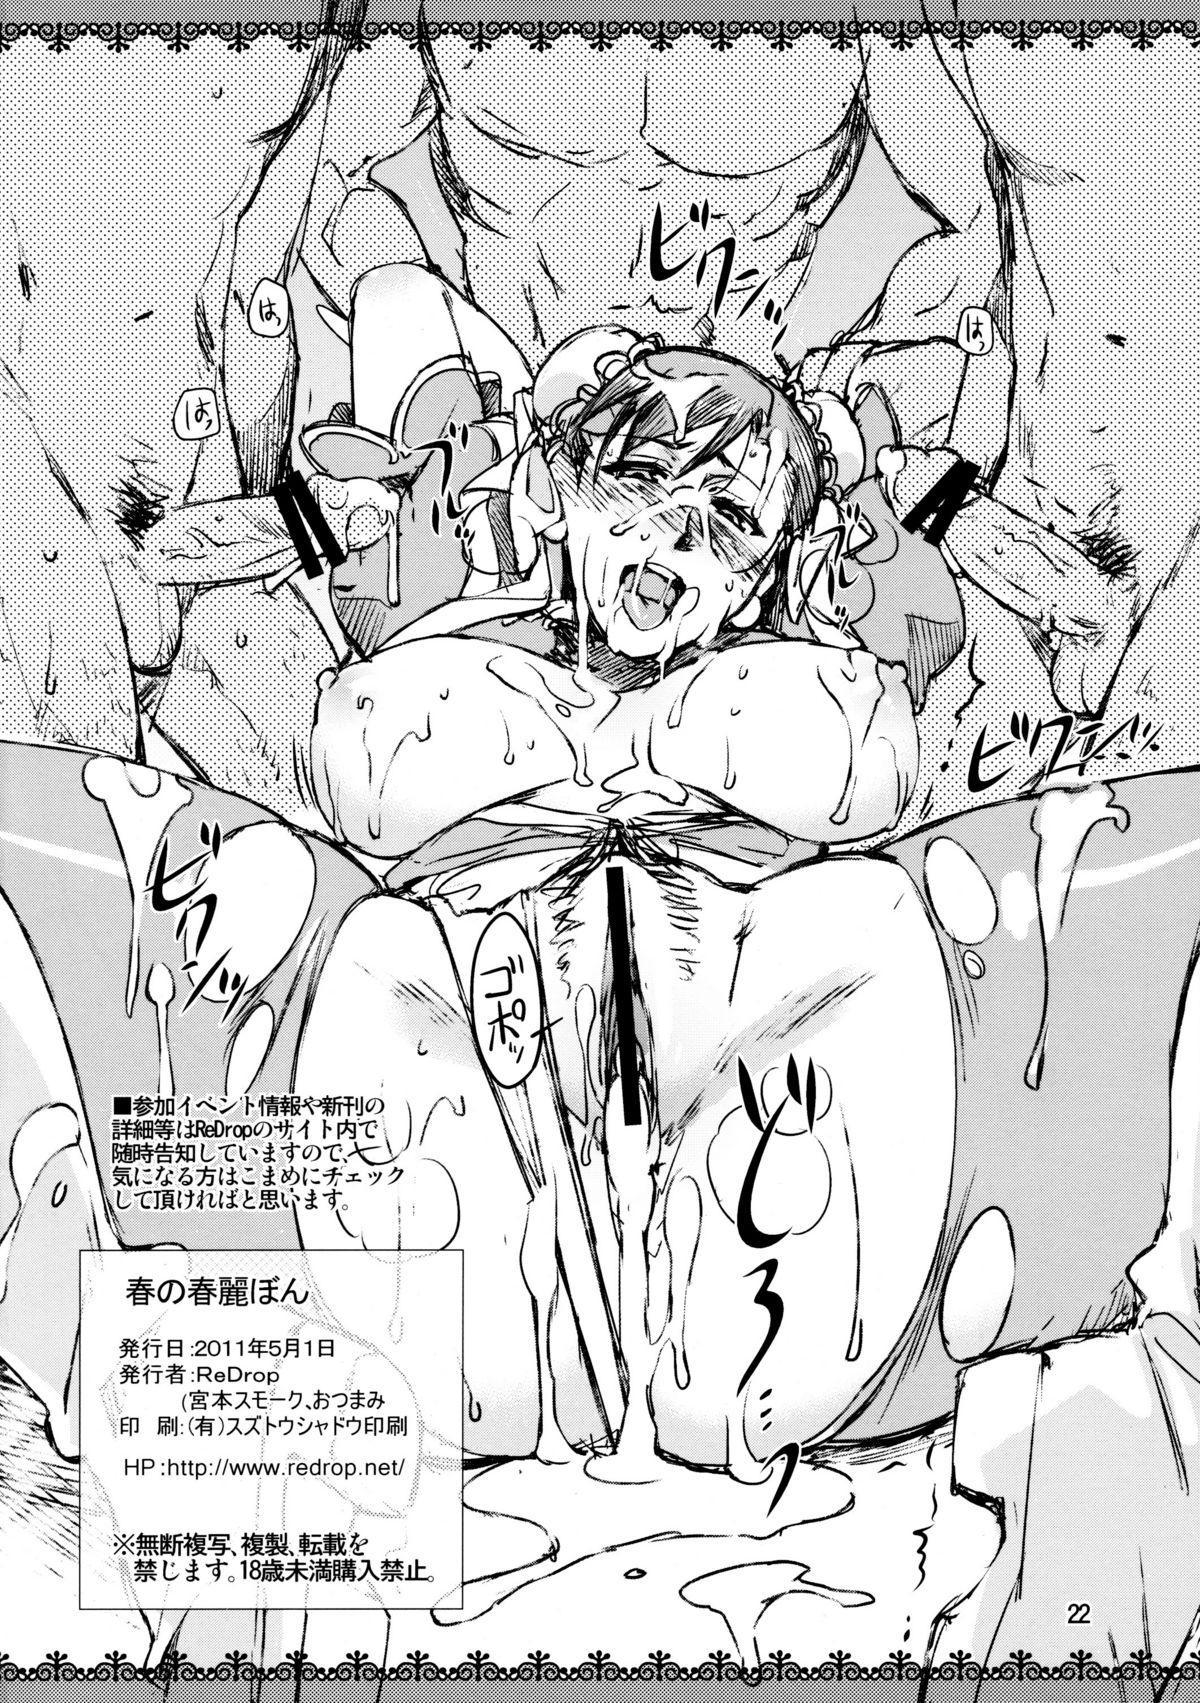 (COMIC1☆5) [ReDrop (Miyamoto Smoke, Otsumami)] Haru no Chun-Li Bon   The Chun-Li Spring Book (Street Fighter) 20